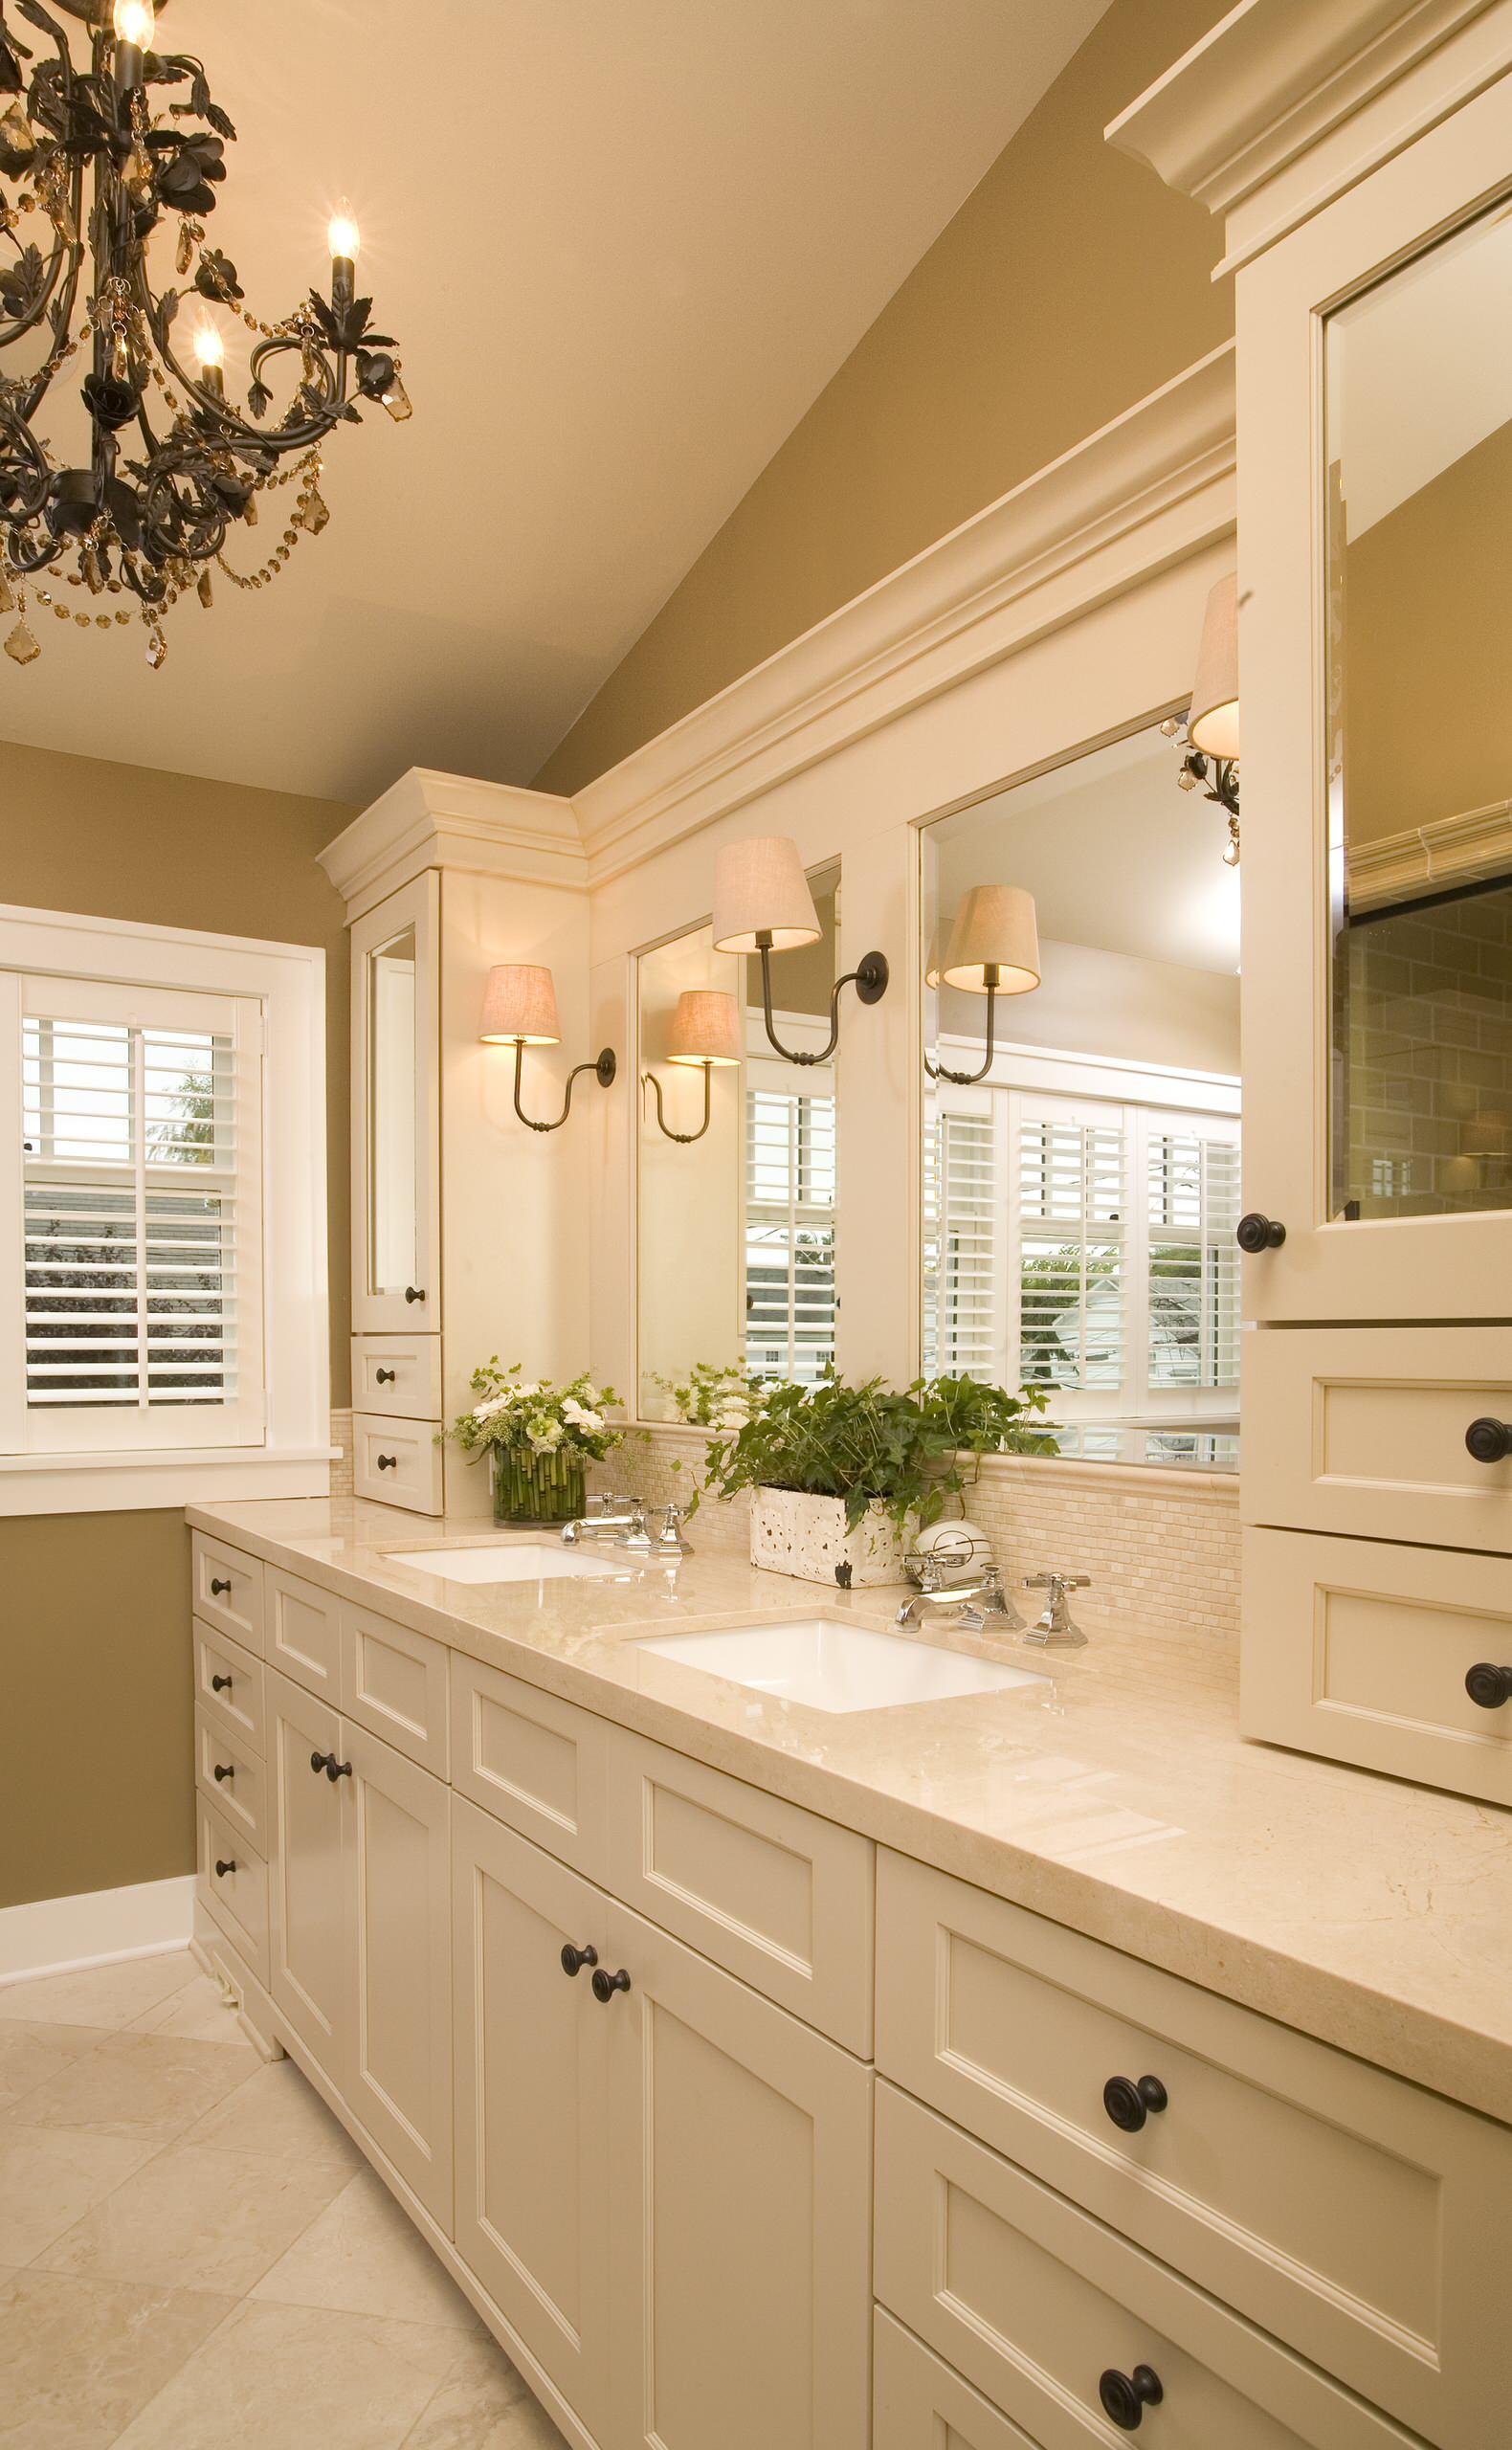 75 Beautiful Travertine Tile Bathroom Pictures Ideas December 2020 Houzz